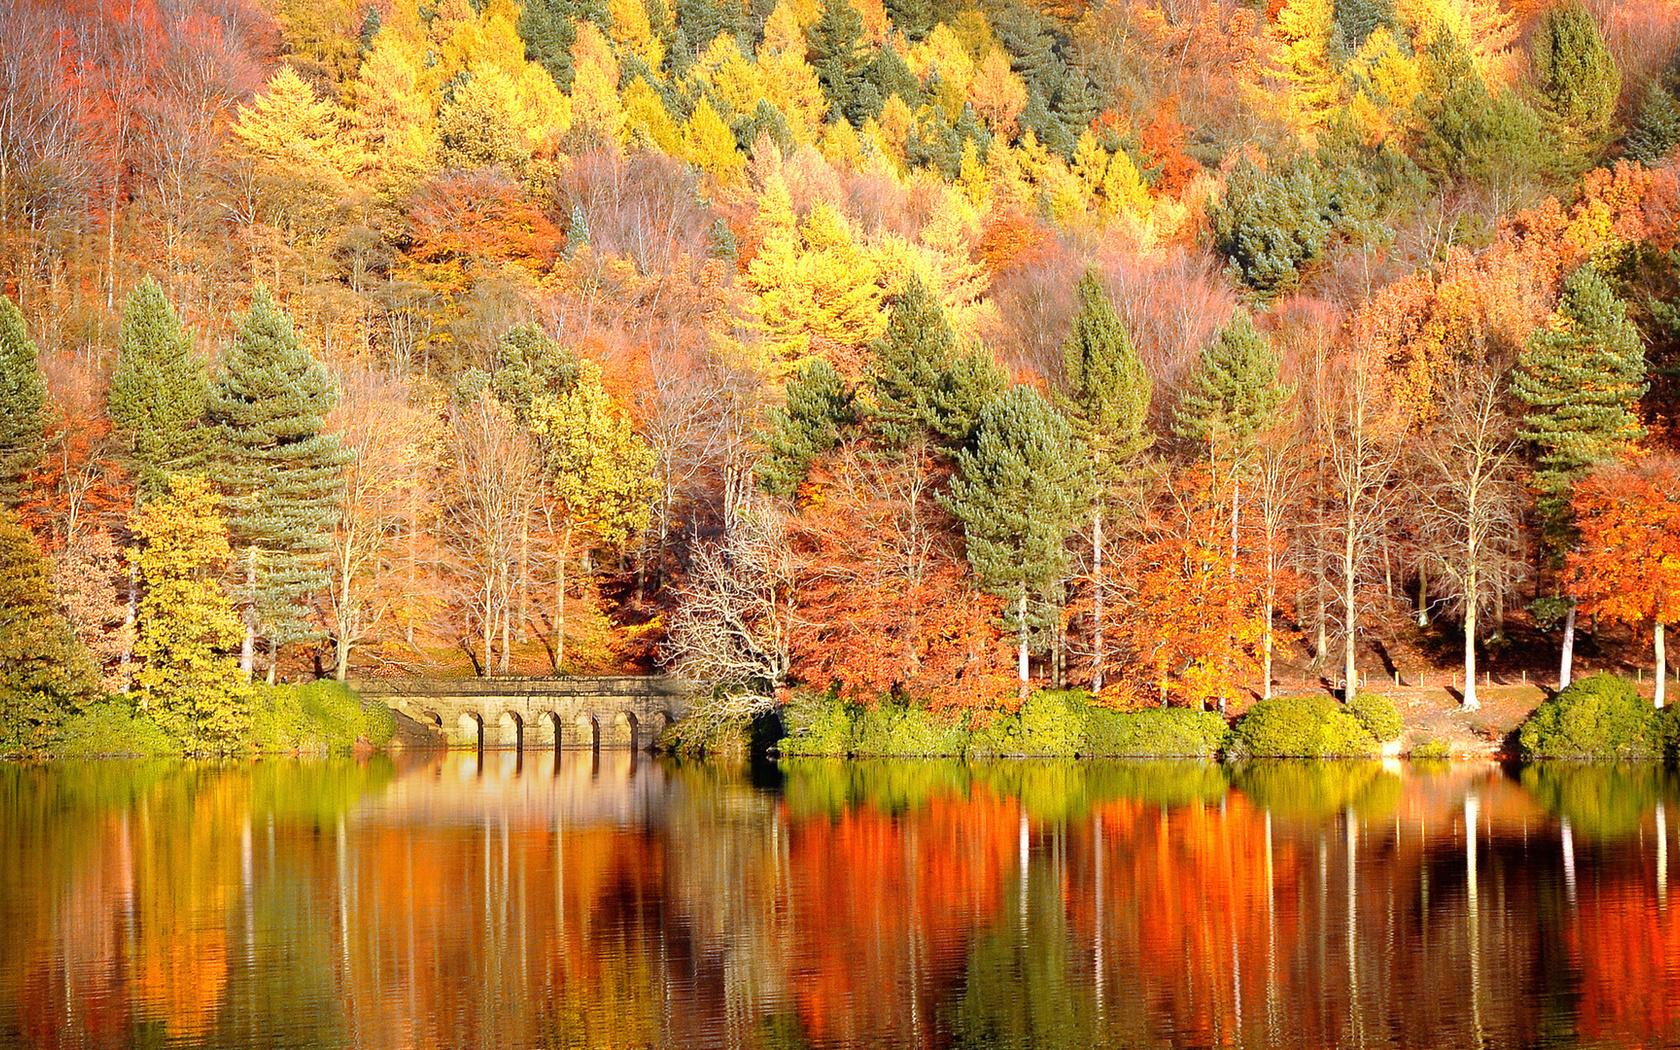 пейзажи в картинках про осень вашему